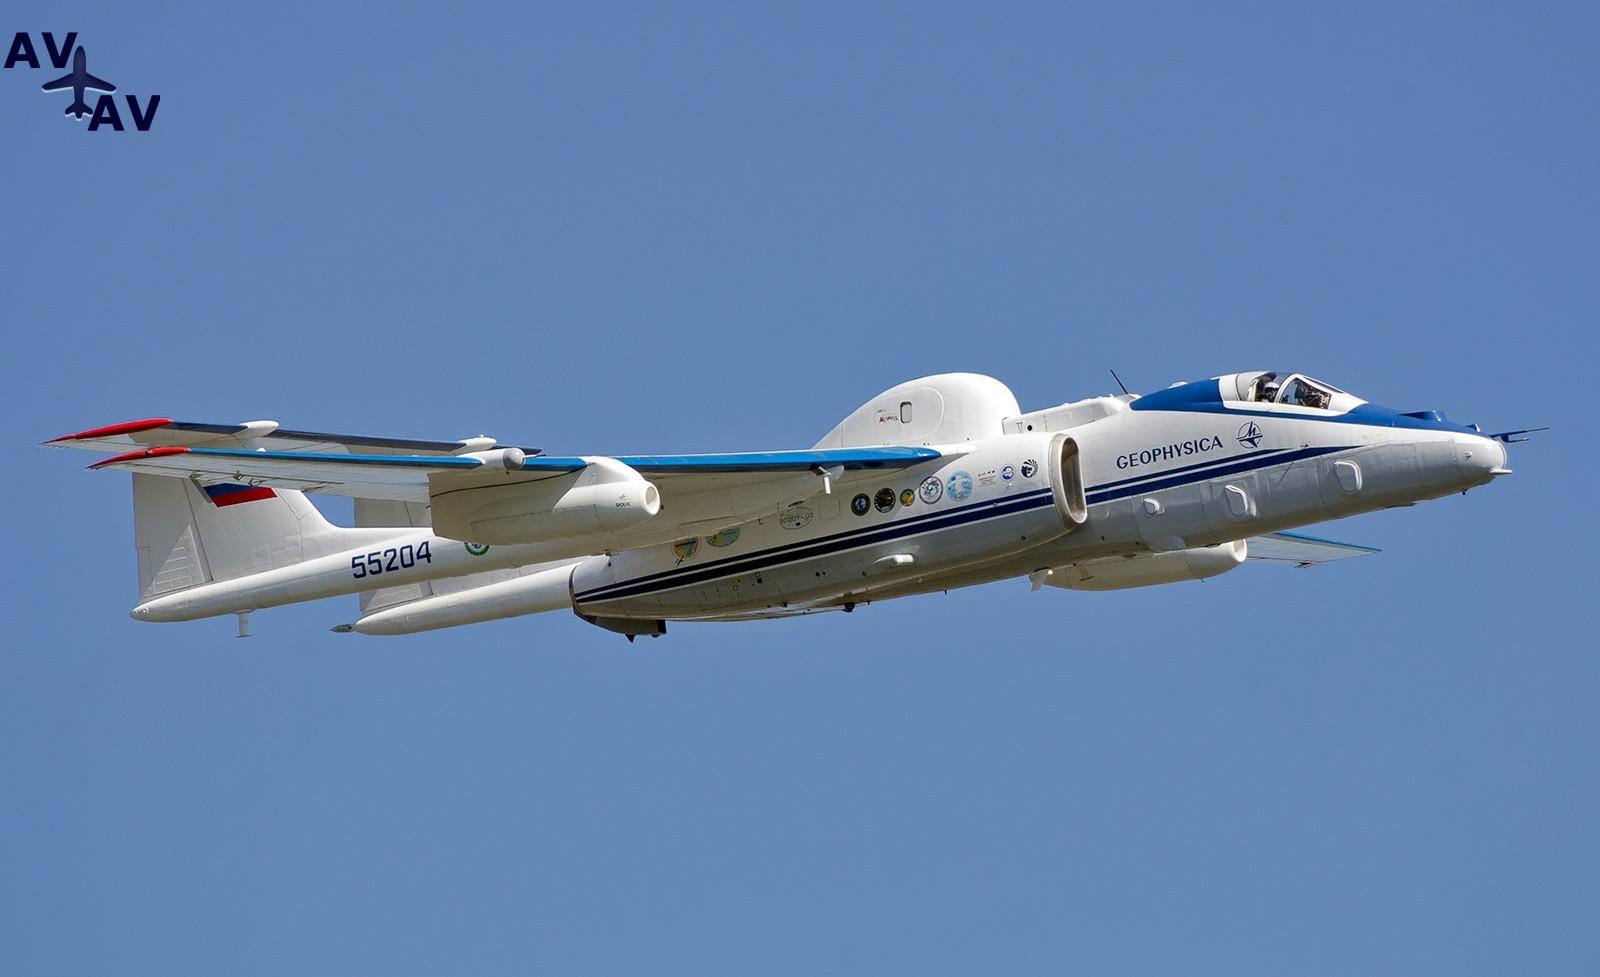 m 55 - Самолет М-55 «Геофизика» законсервировали до 2020 года